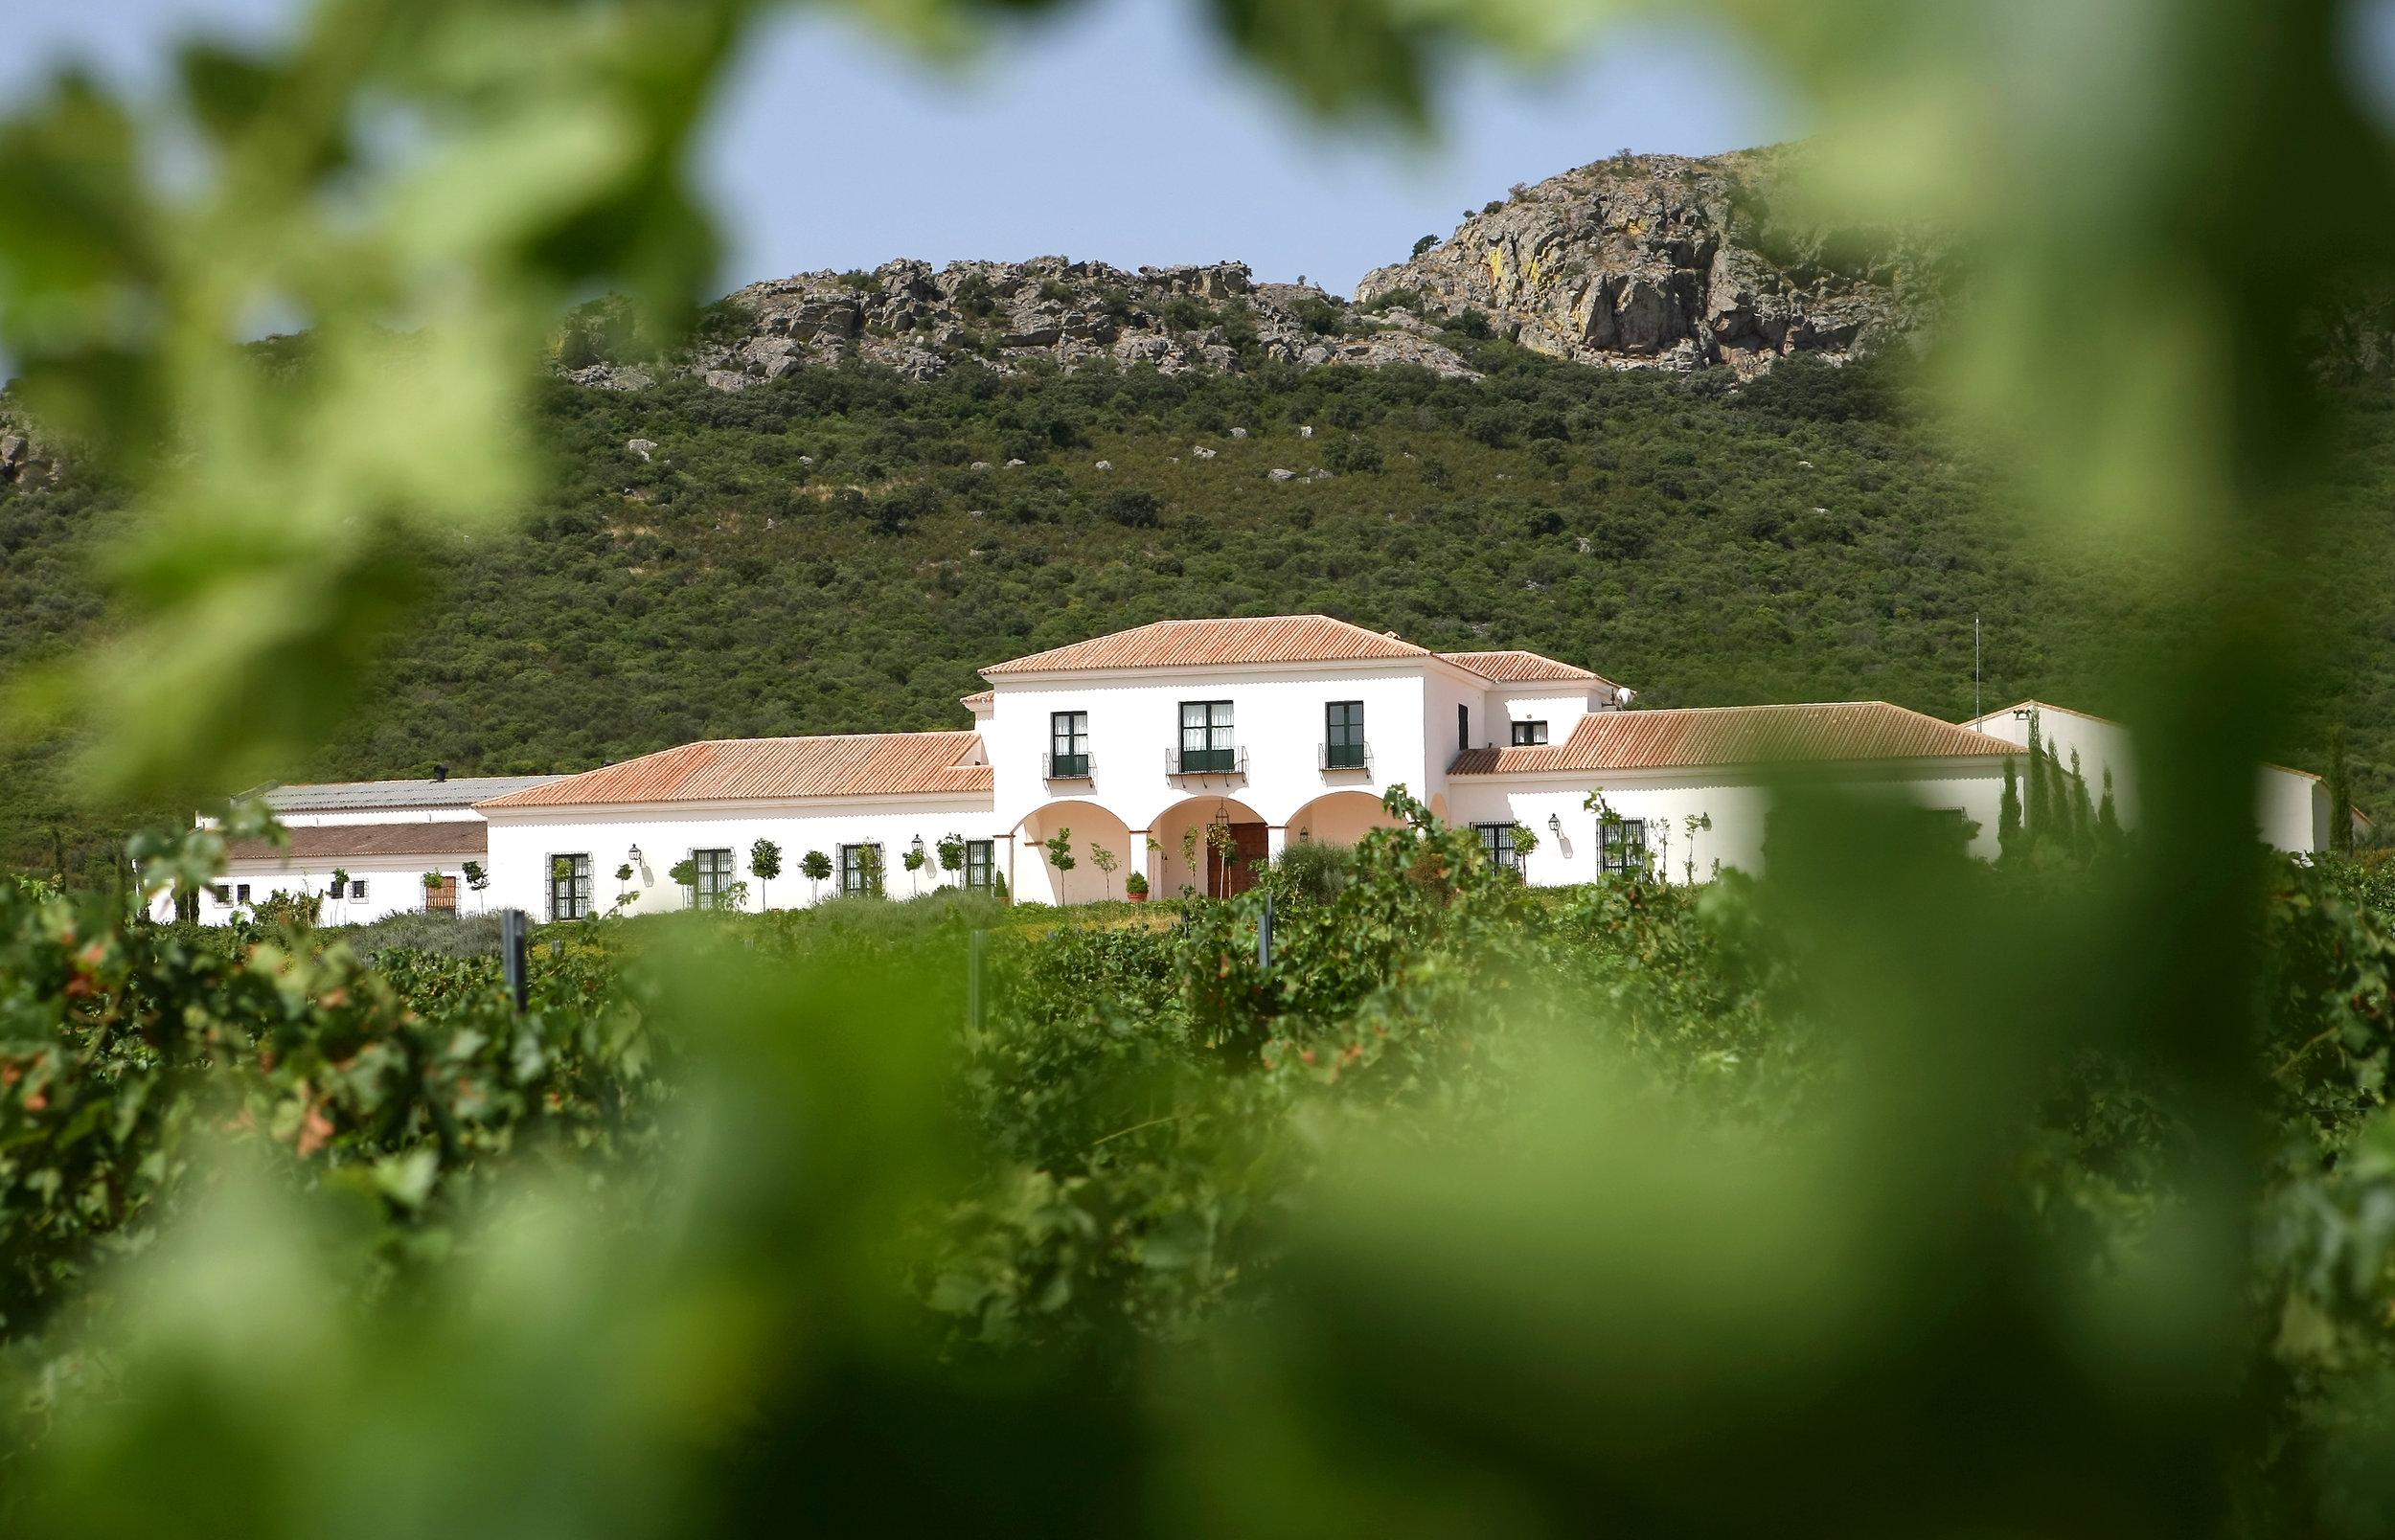 Viña Santa Marina Winery located in Mérida, in the South-West region of Spain.